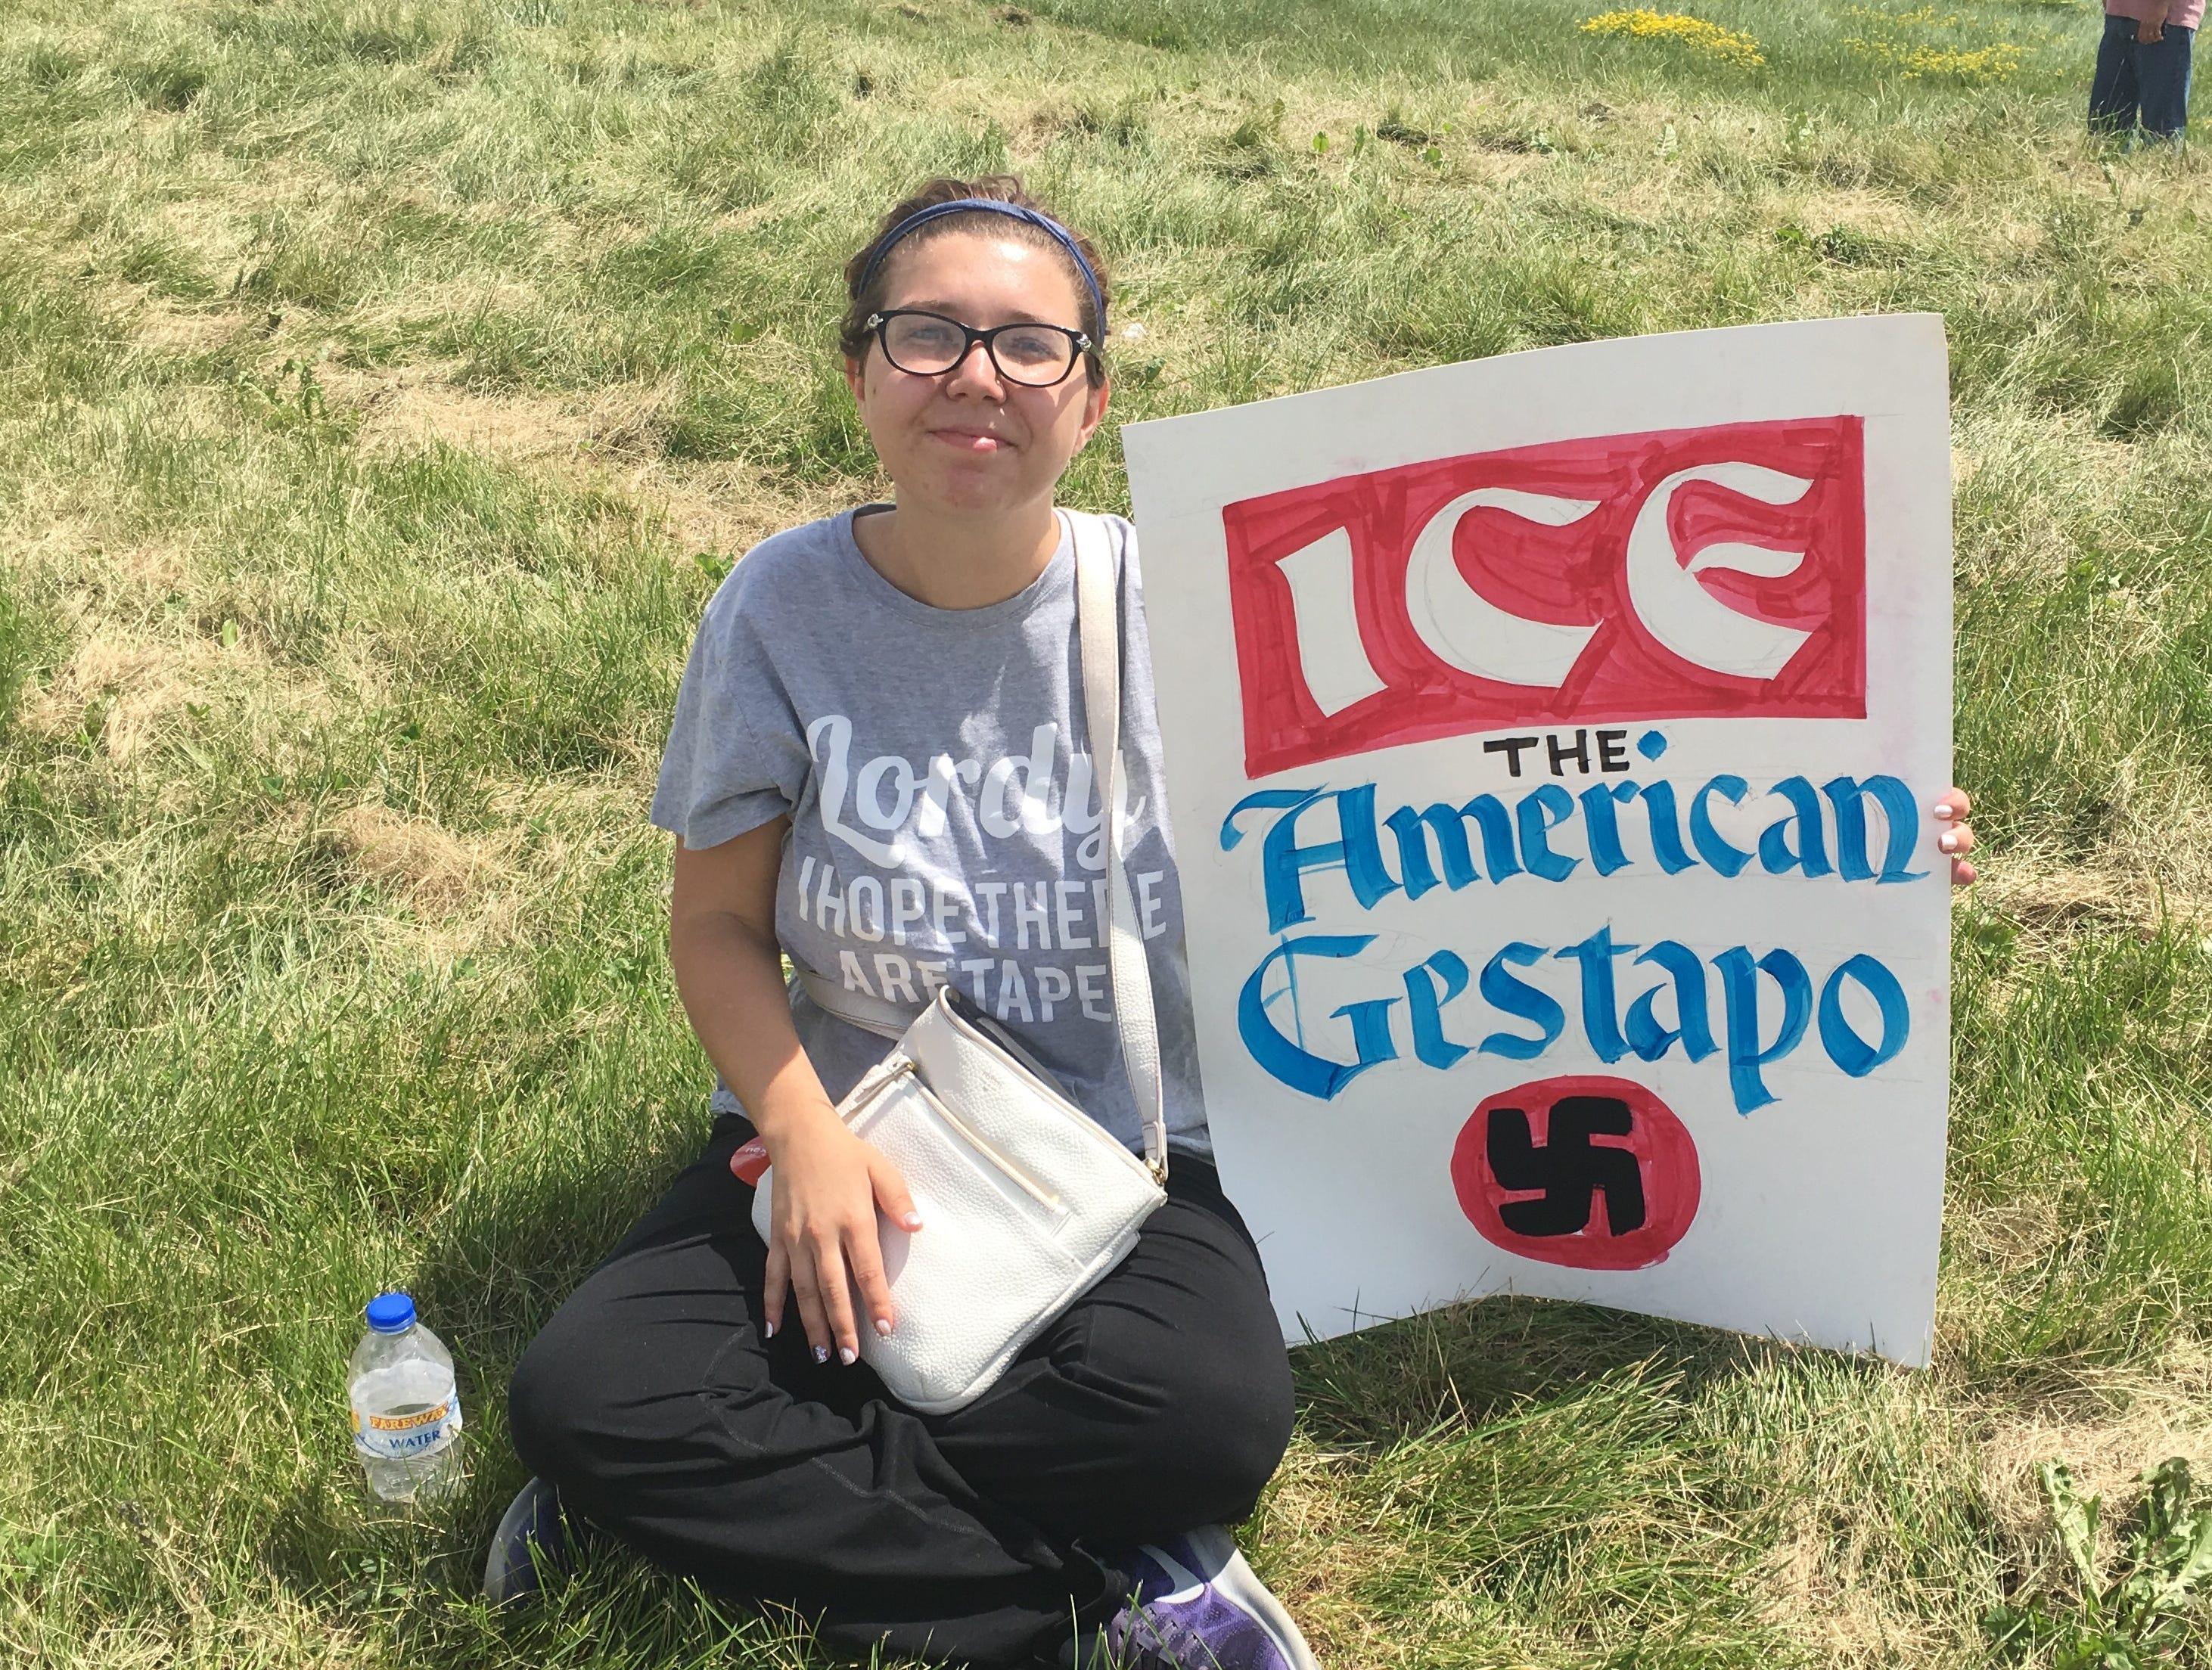 Rachel Greene, 23, of Cedar Rapids, came to Peosta to protest President Donald Trump Thursday, July 26, 2018.